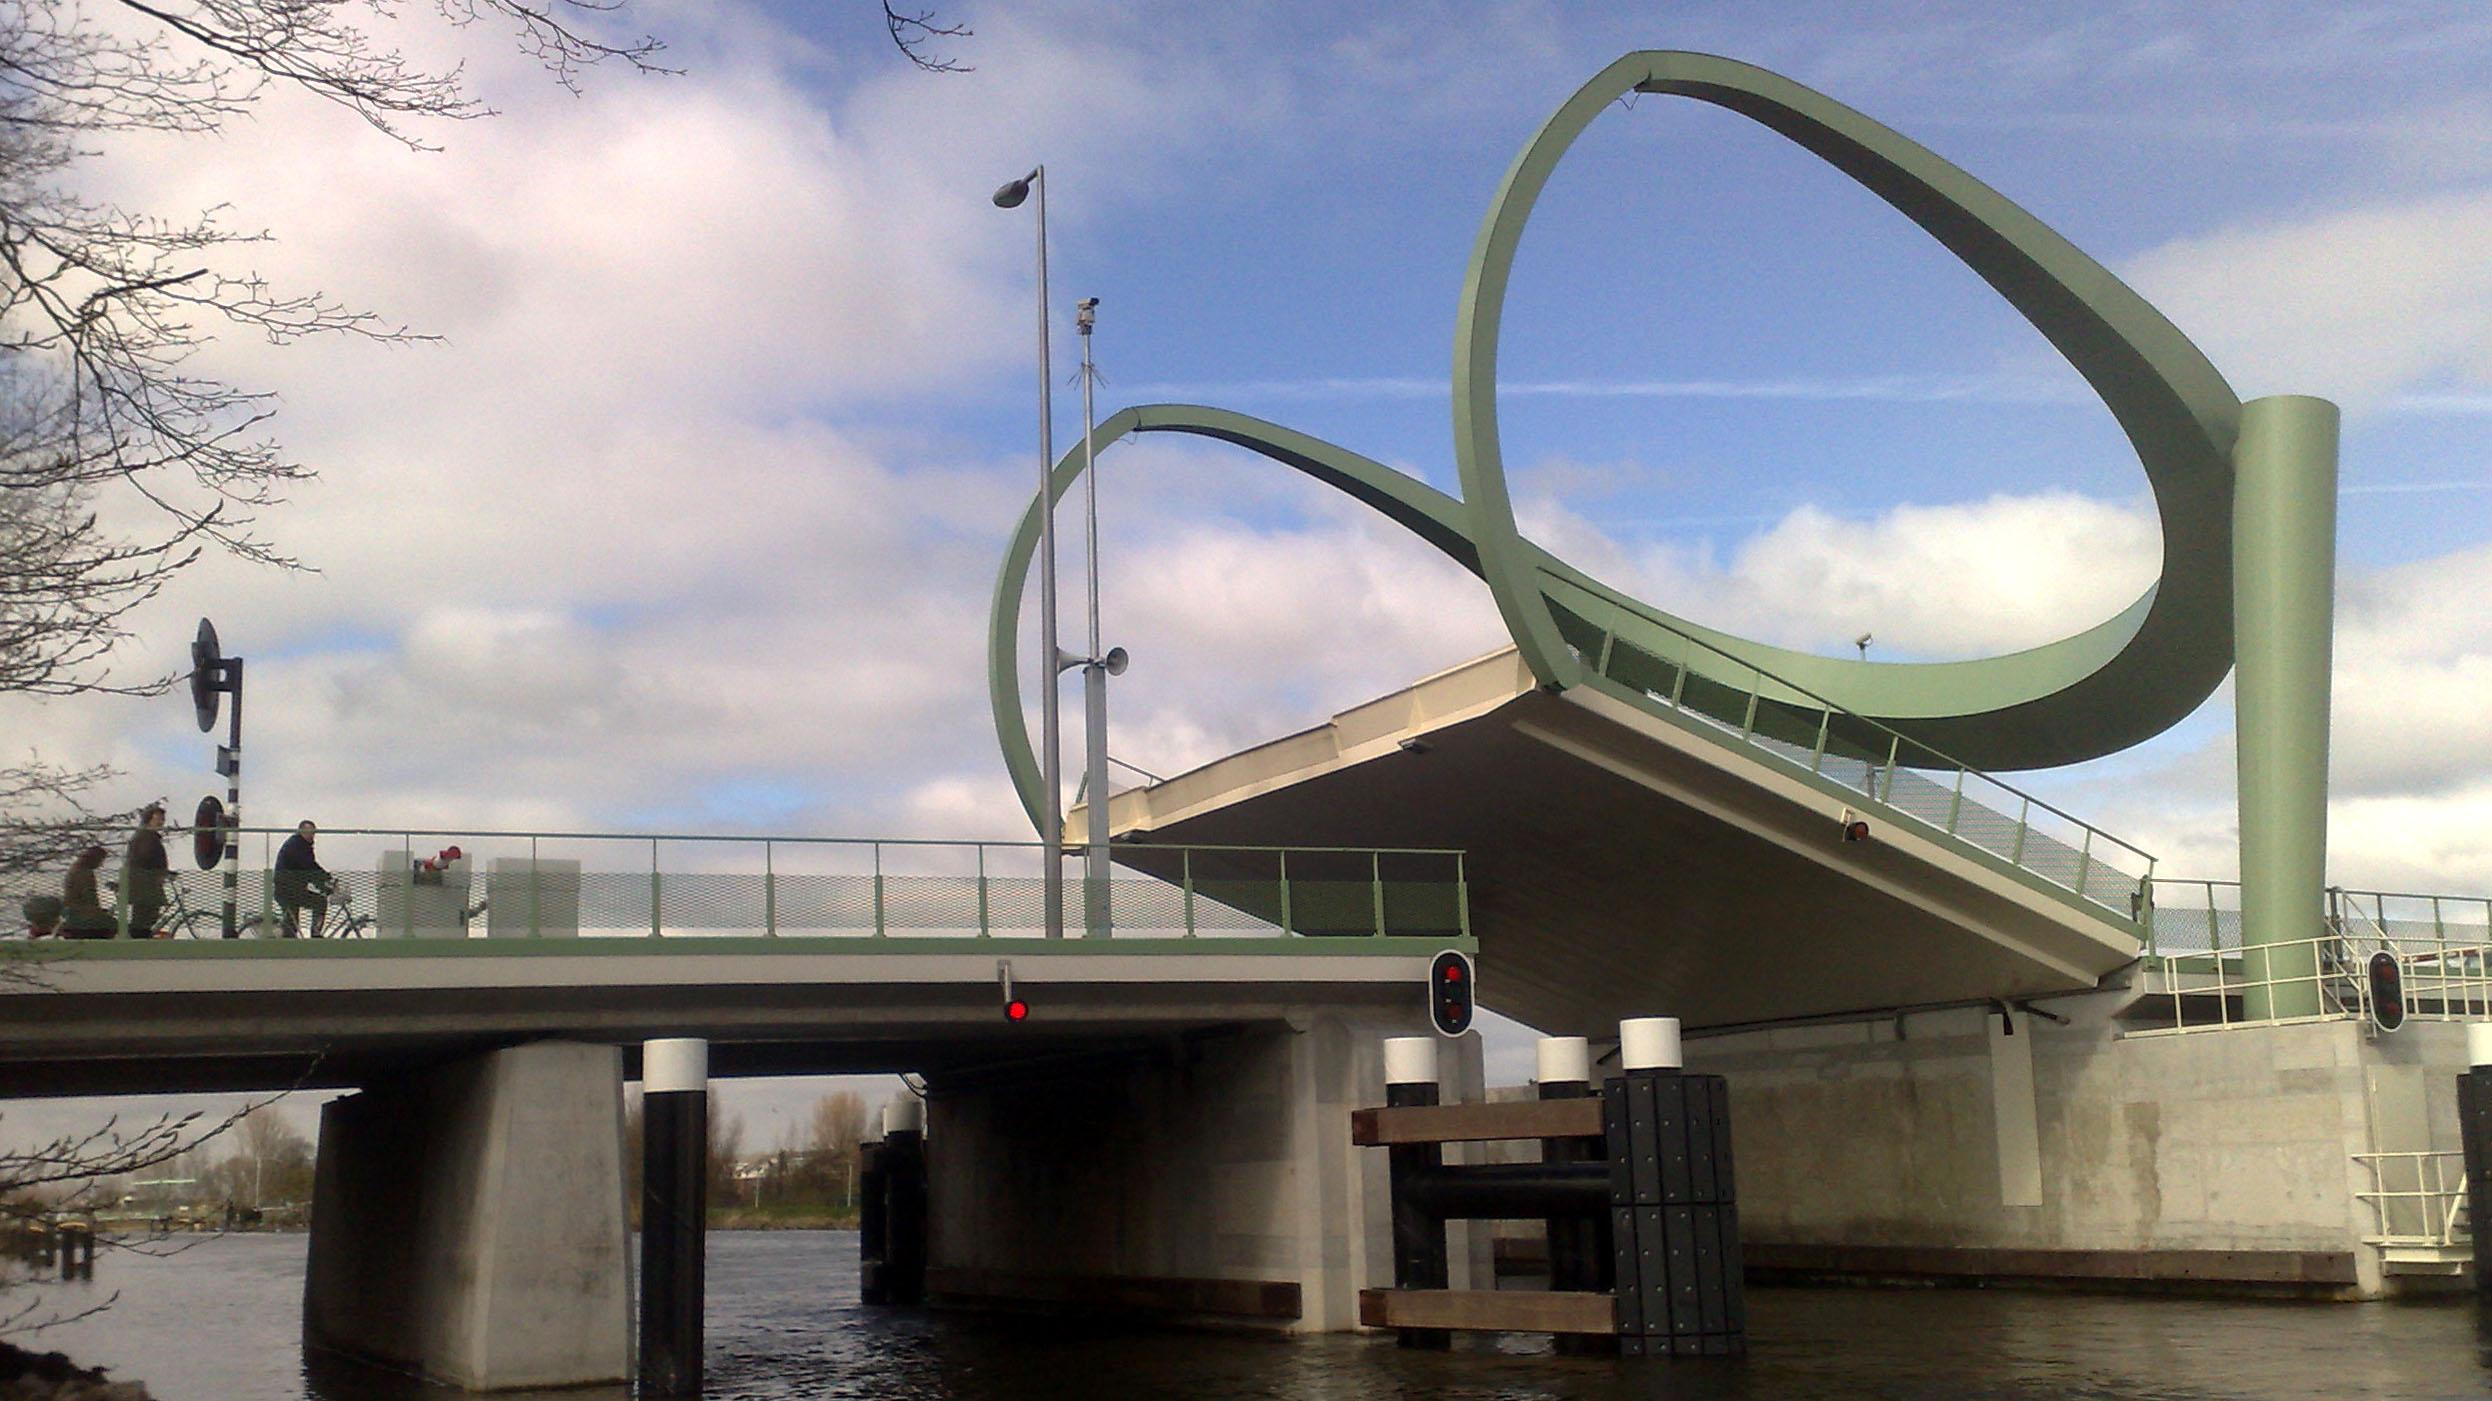 spaanse brug Spaanse polder rotterdam architect marja haring